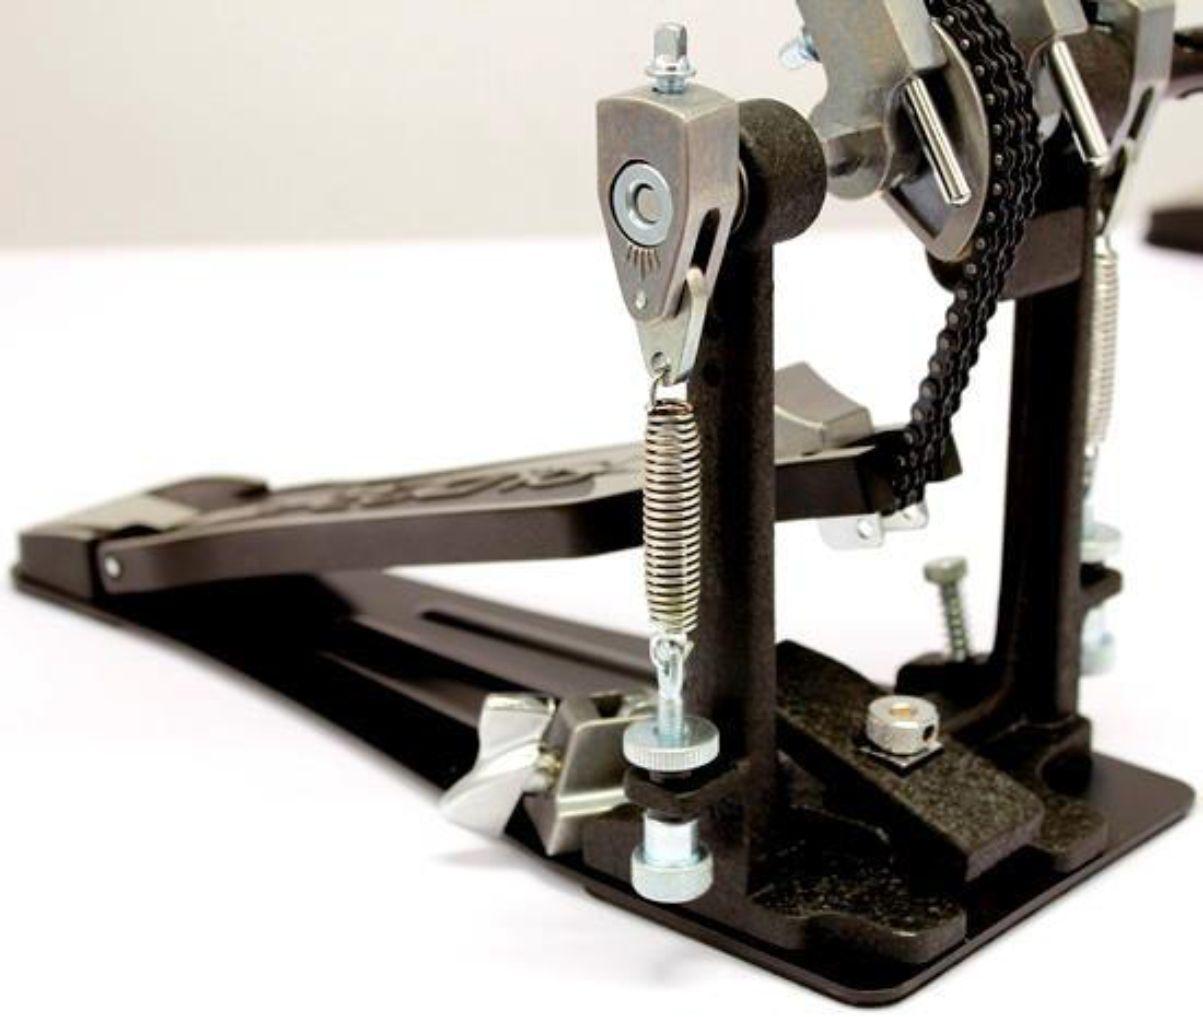 Pedal Duplo Odery Fluence Pd-802fl Dual Chain Drive Com Corrente Dupla